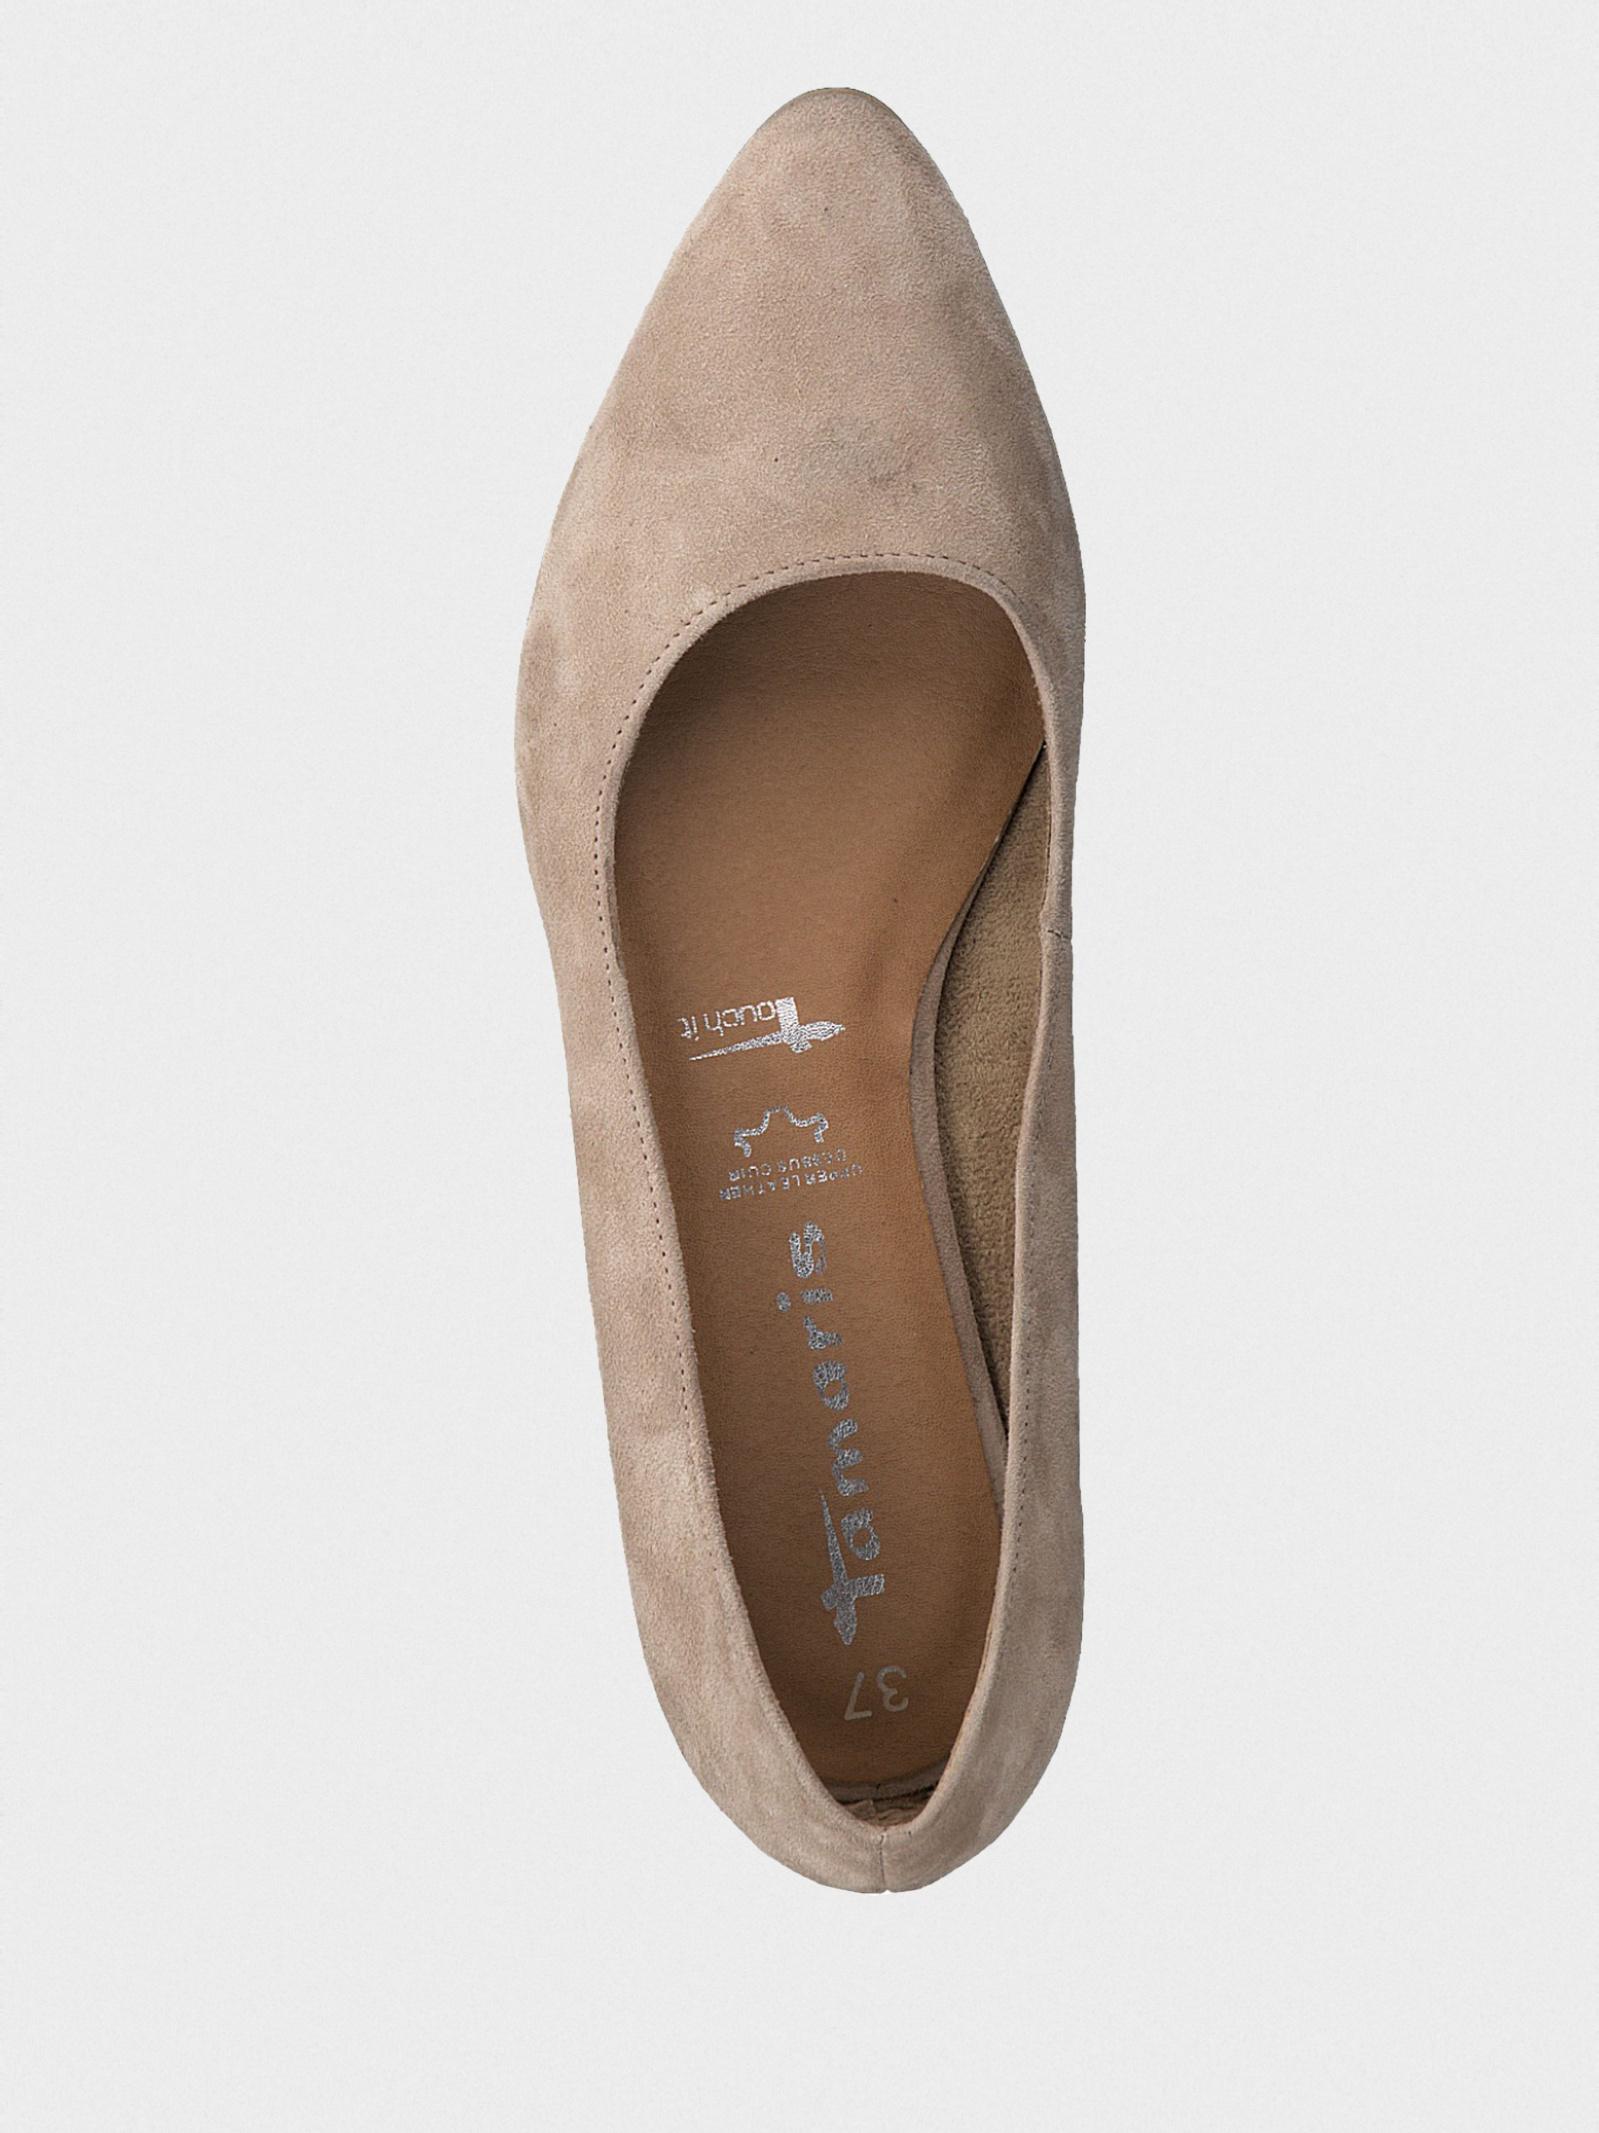 Балетки для женщин Tamaris IS718 размеры обуви, 2017